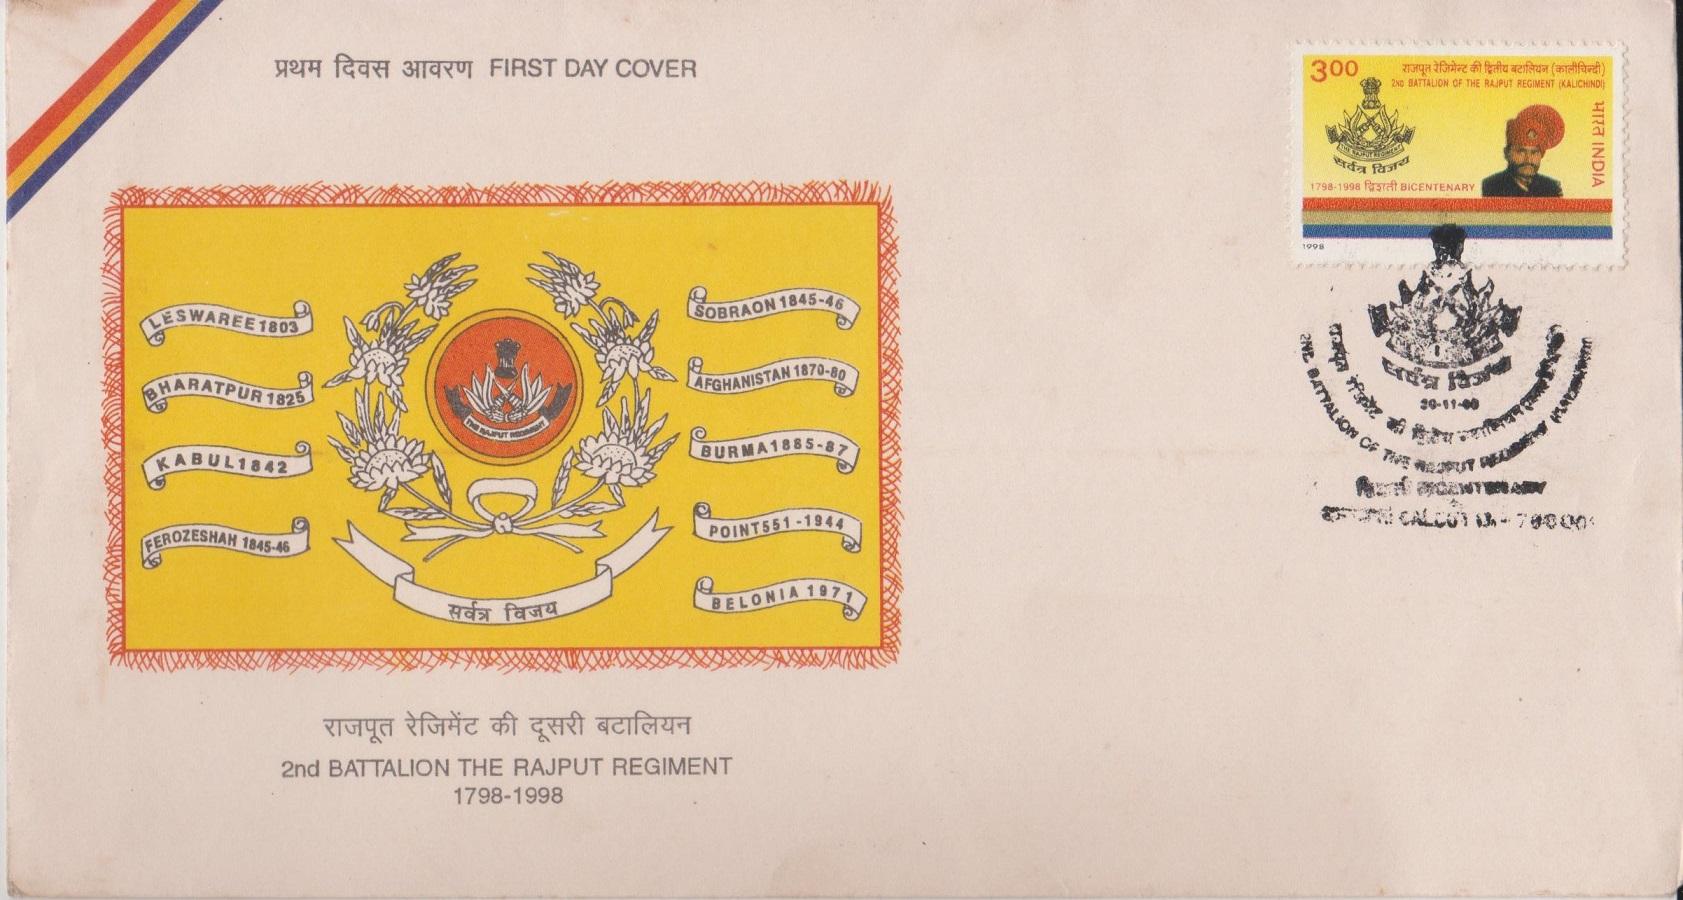 Sarvatra Vijay (Victory Everywhere)